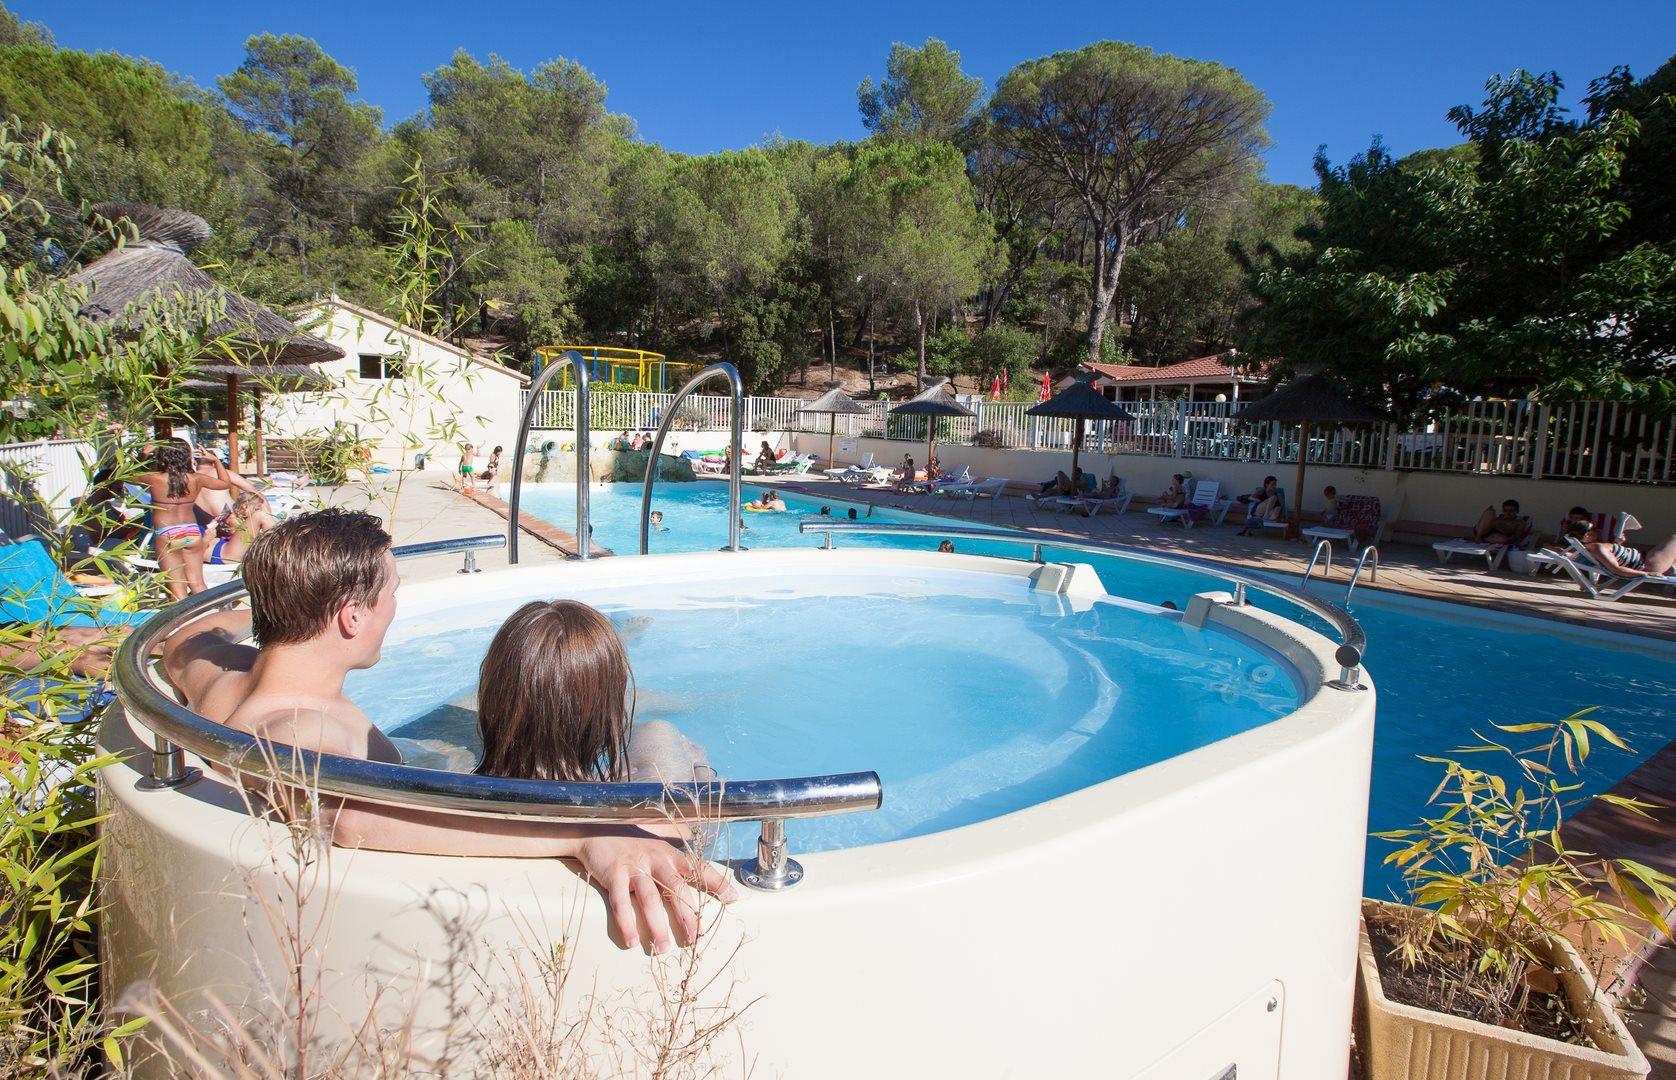 Frankrijk-Crespian-Camping%20Le%20Mas%20de%20Reilhe-ExtraLarge Wintersport Frankrijk